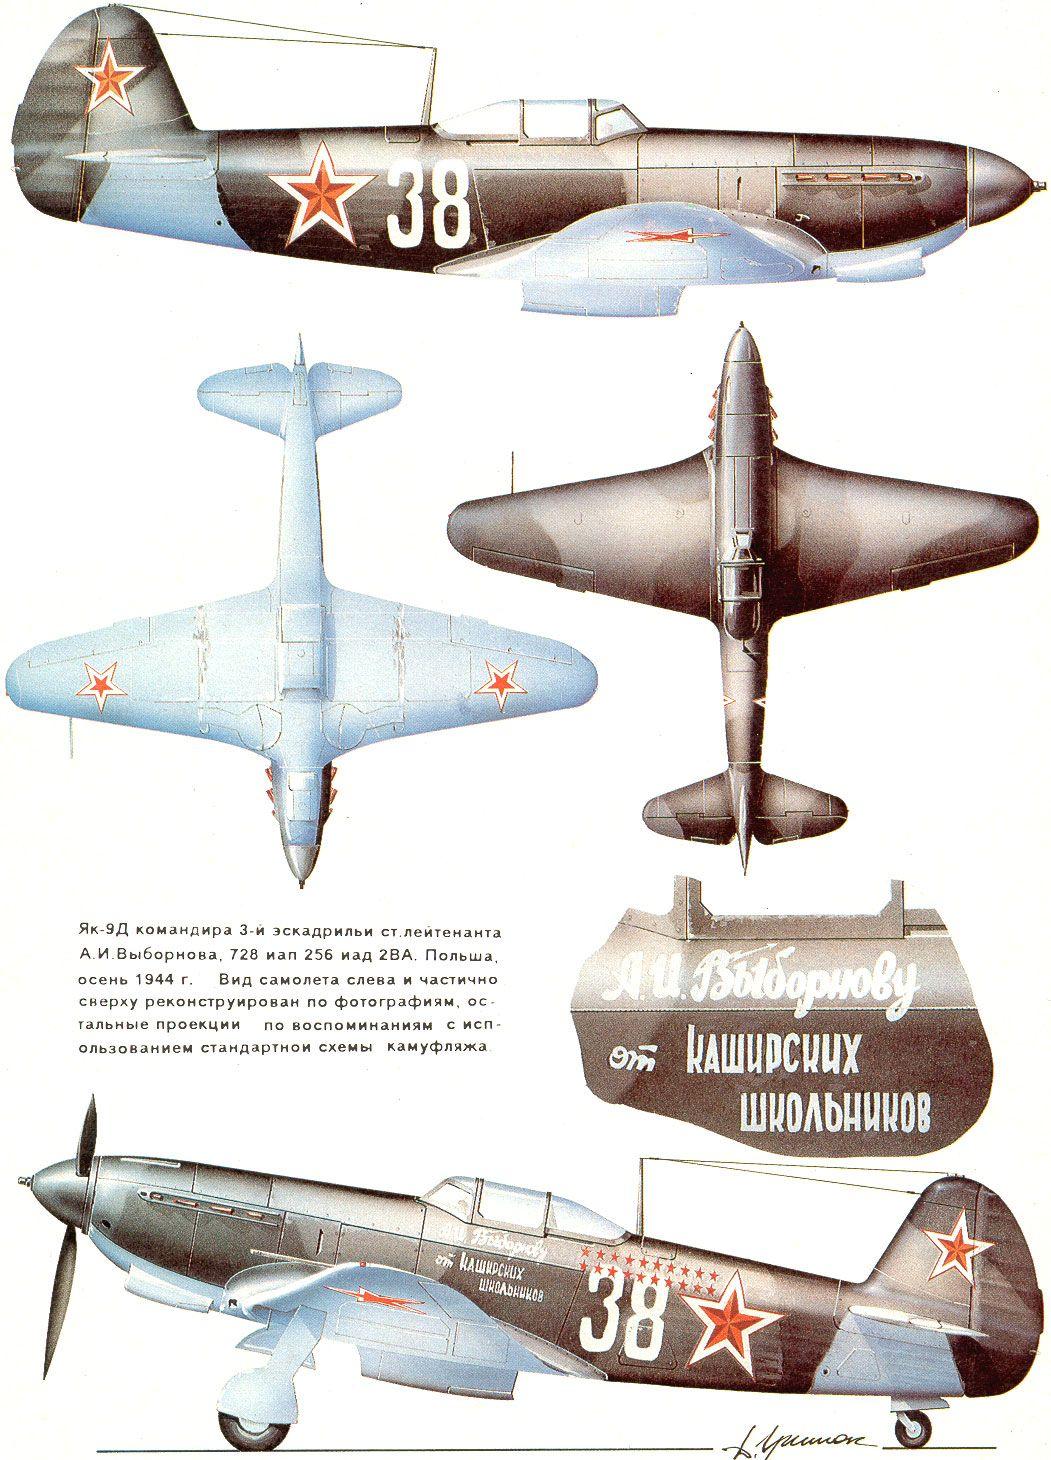 Planes - Yakovlev Yak-9